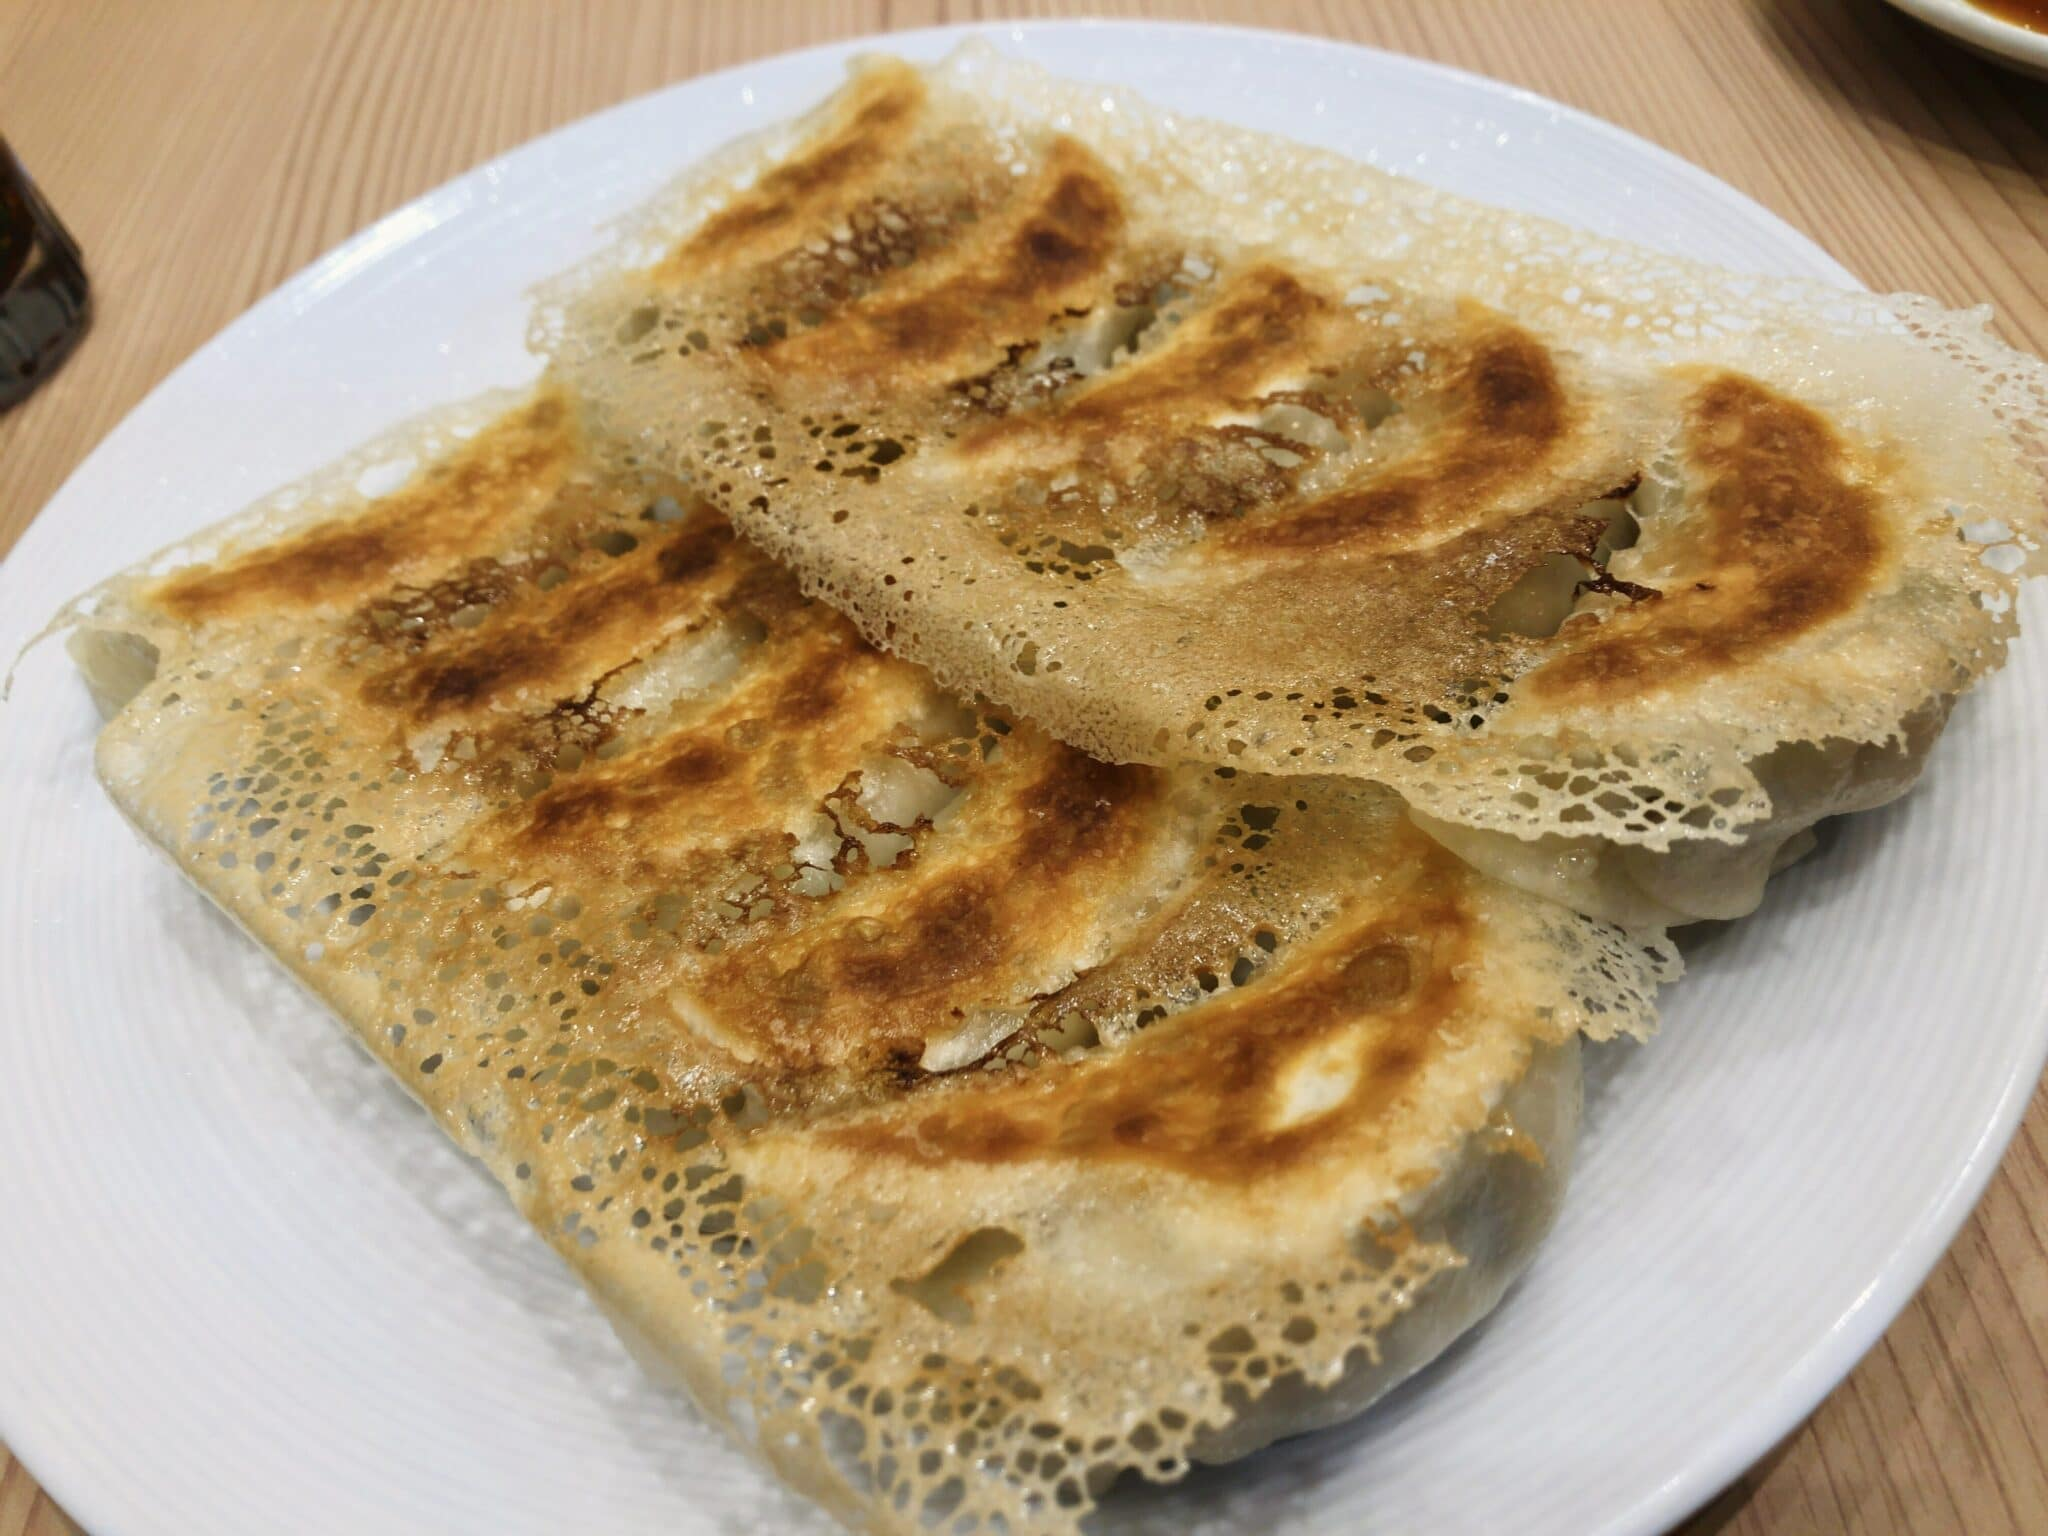 良記餃子軒の良記餃子定食②